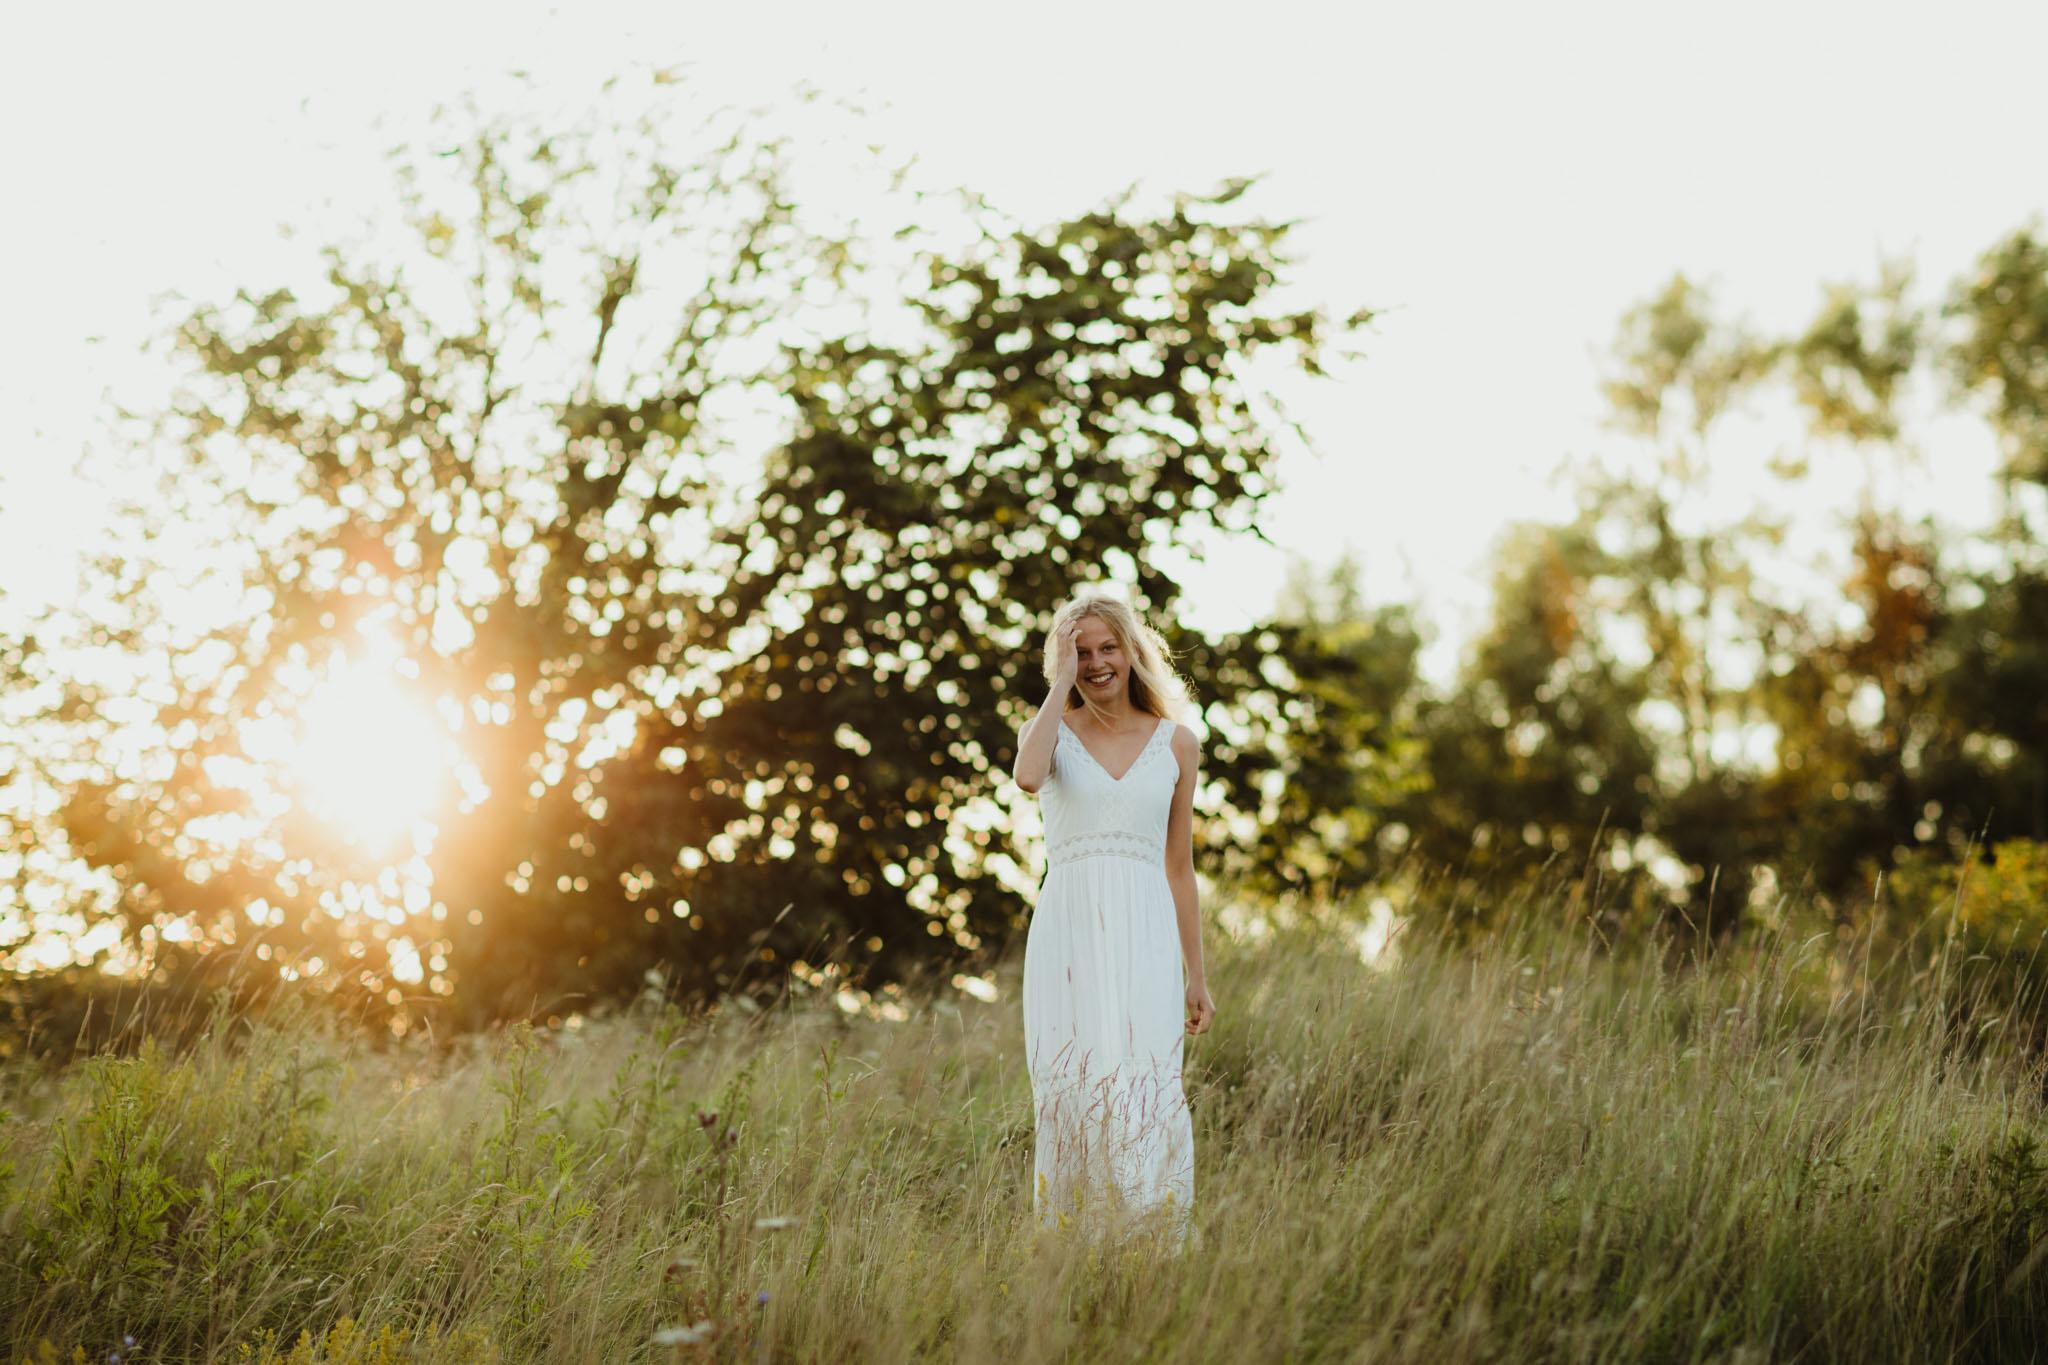 Konfirmasjonsfoto - jente i hvit kjole - Fotograf Ida Hvattum